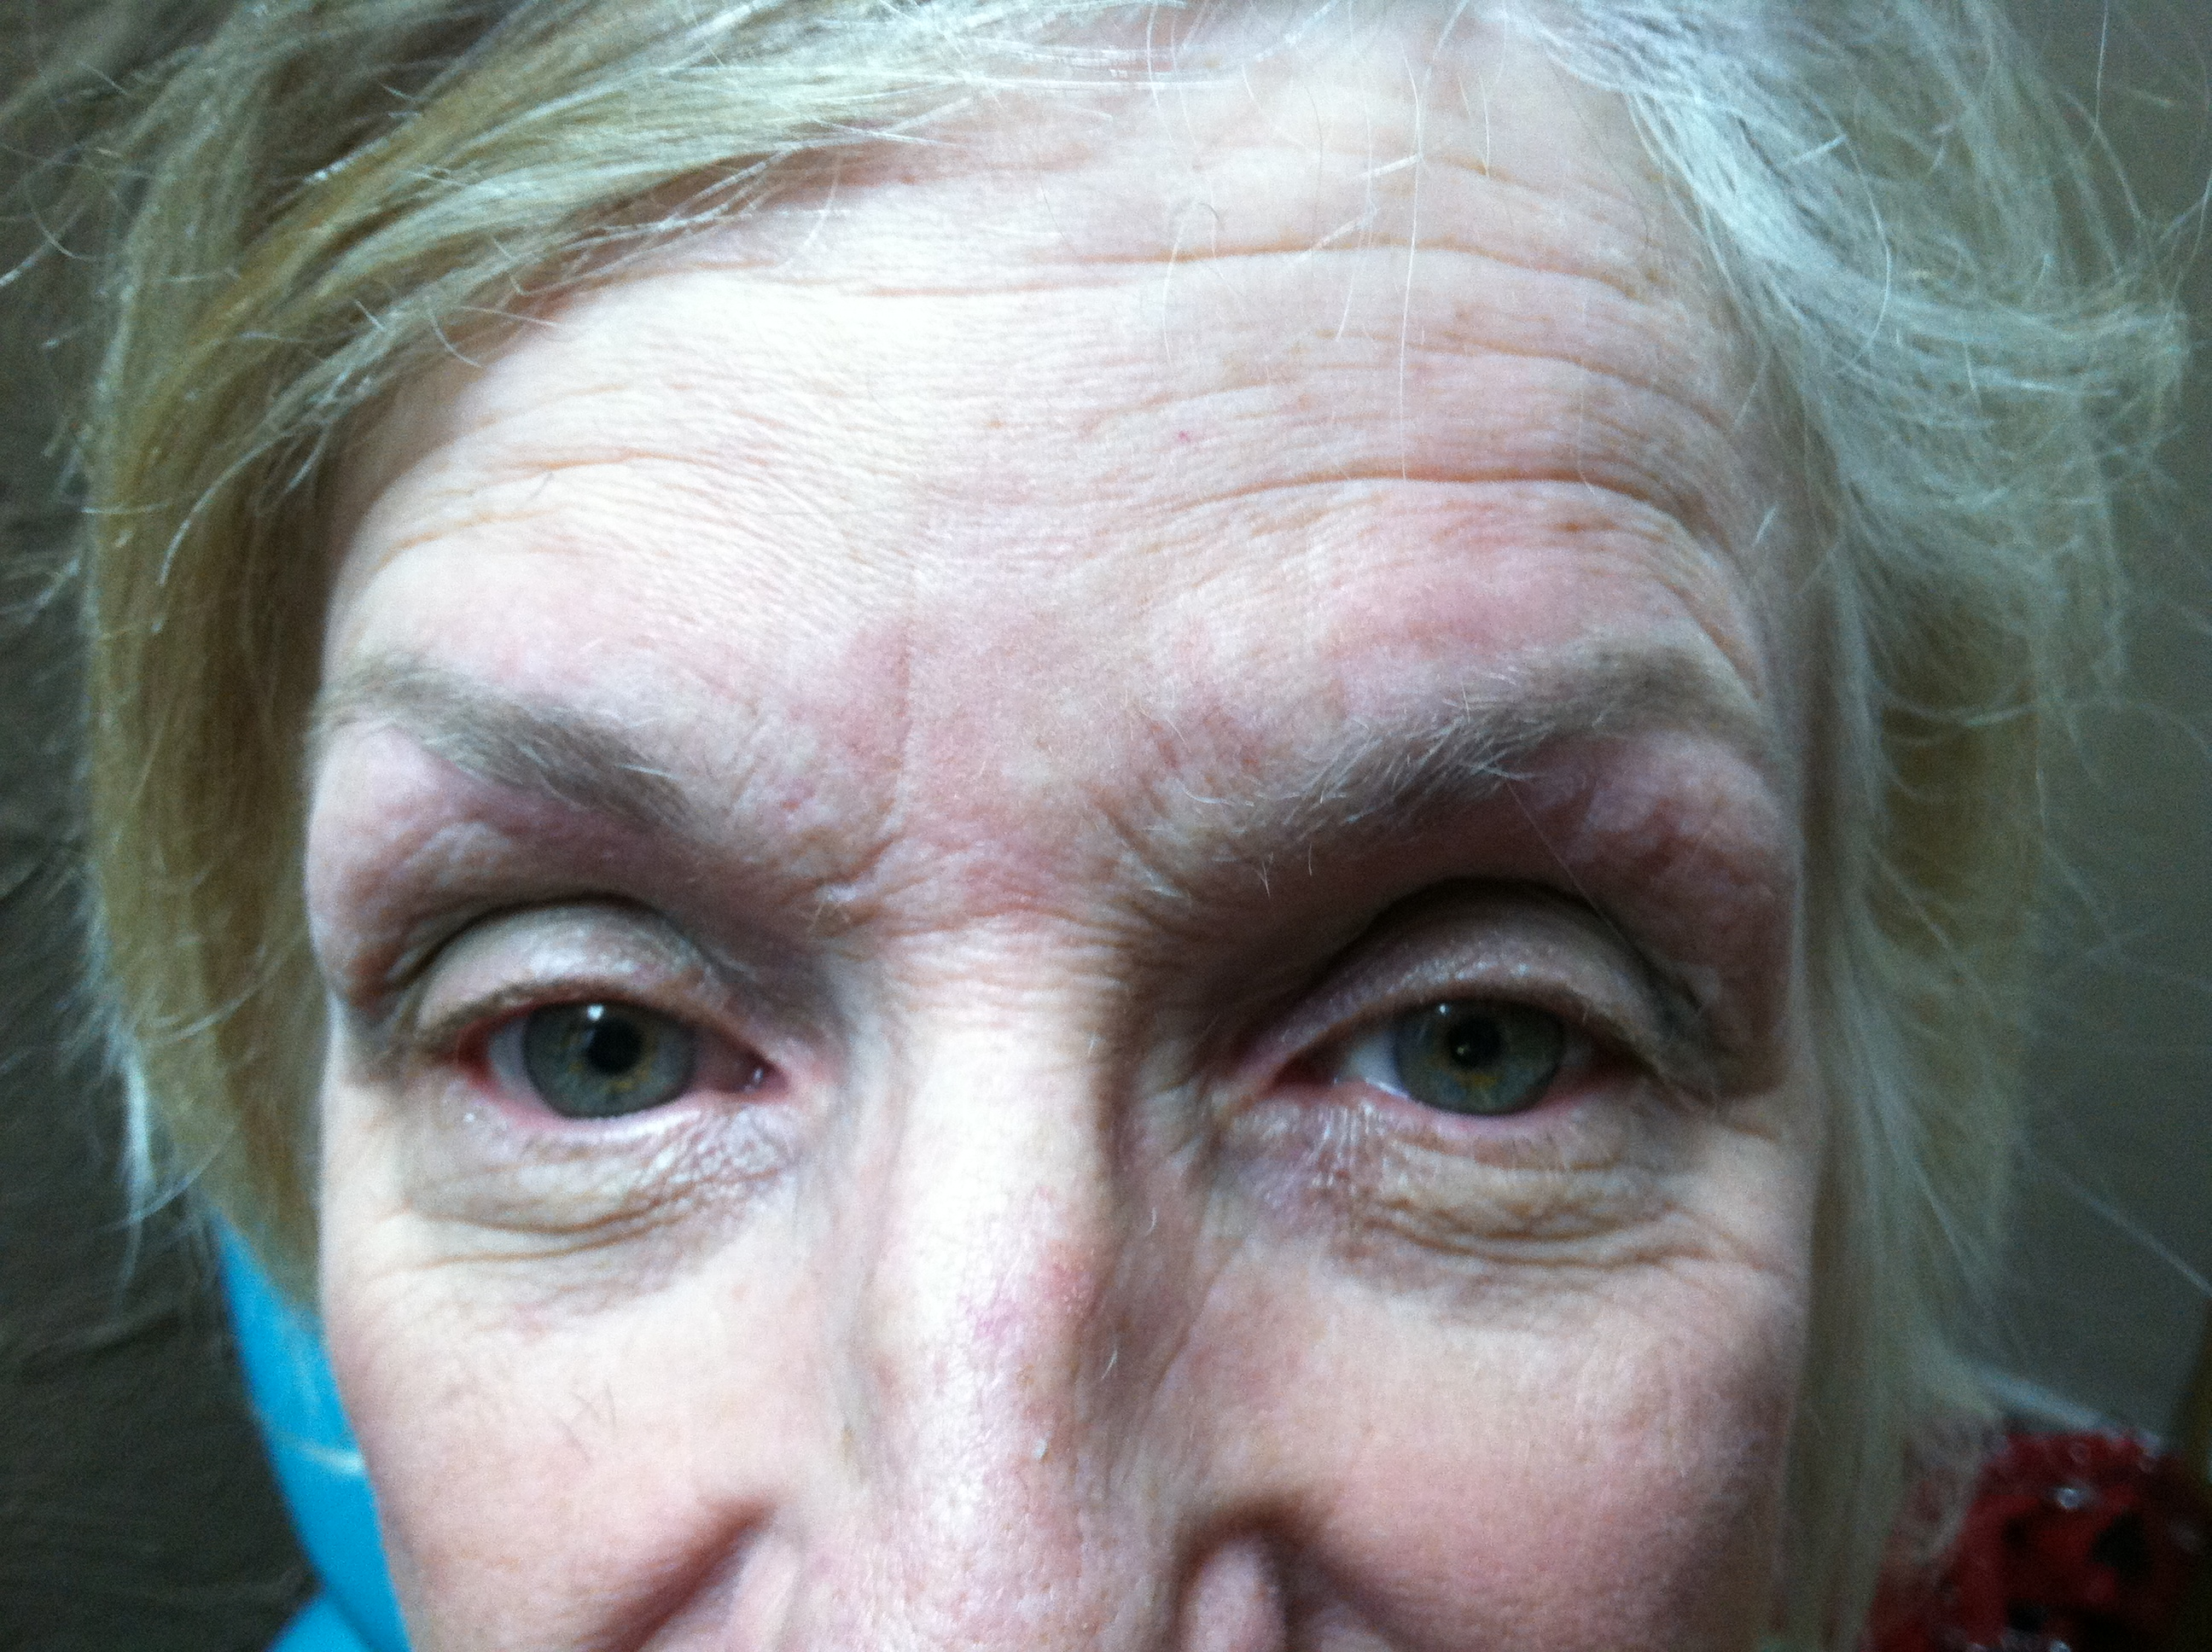 Eyebrow Threading: After